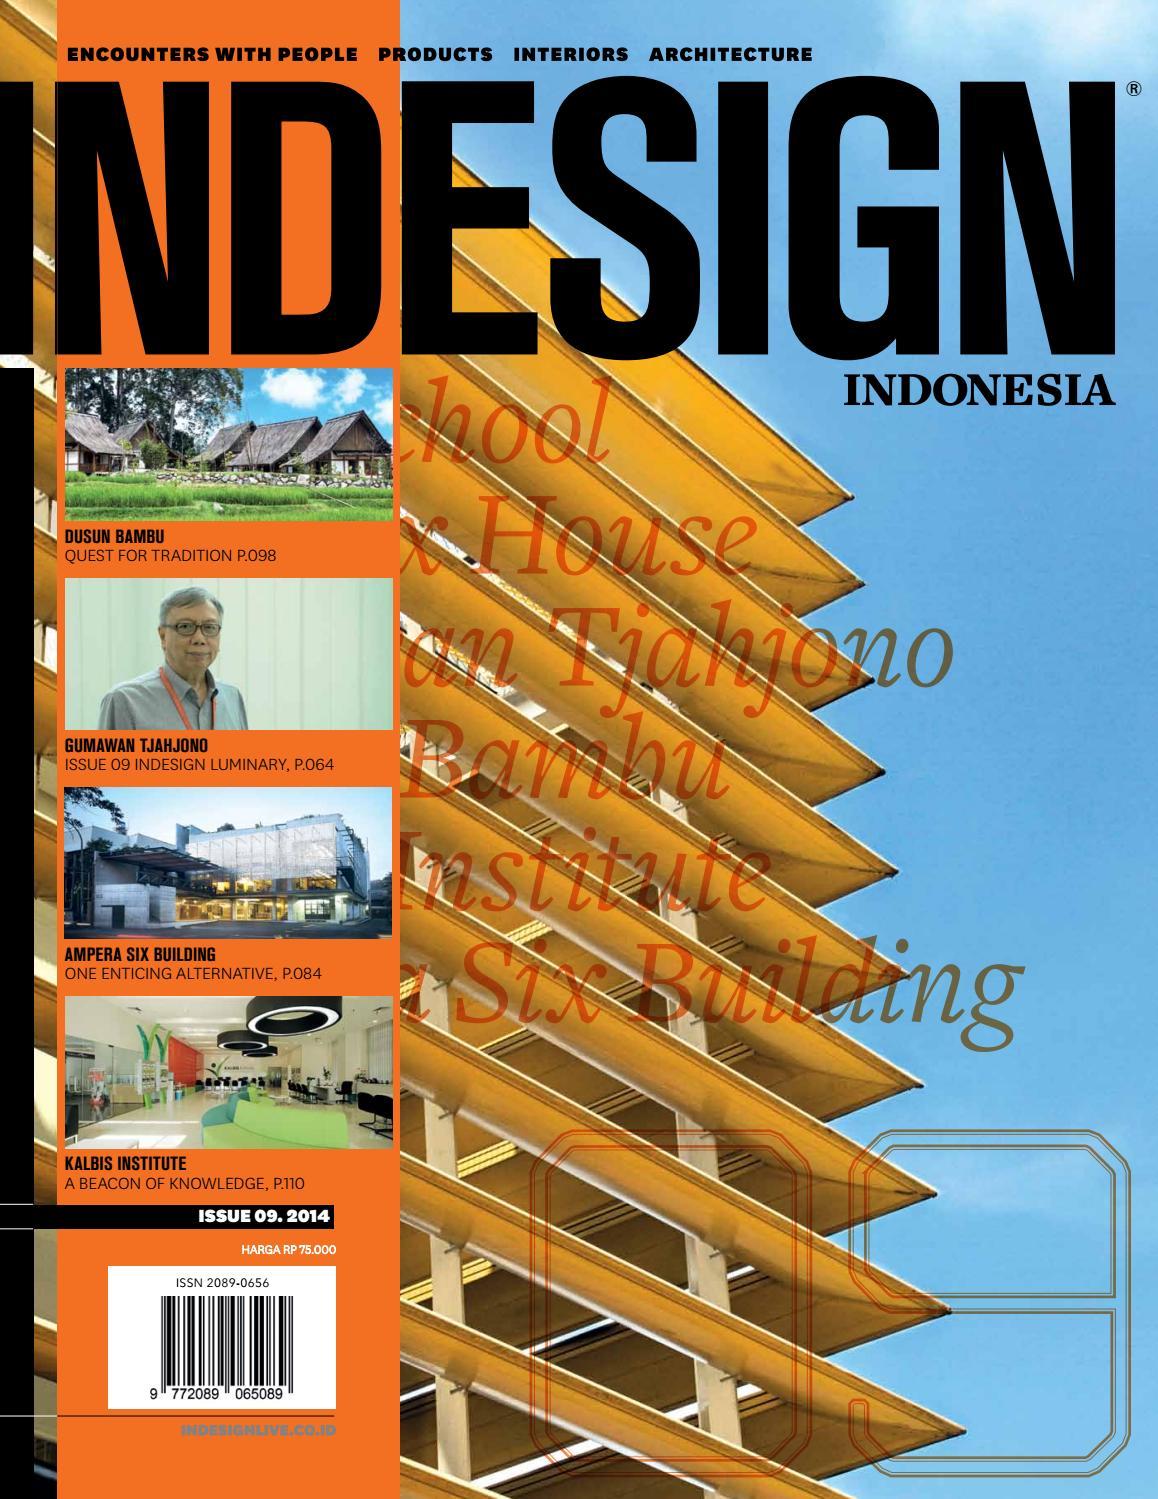 Indesign Indonesia 9 2014 By Sunthy Sunowo Issuu